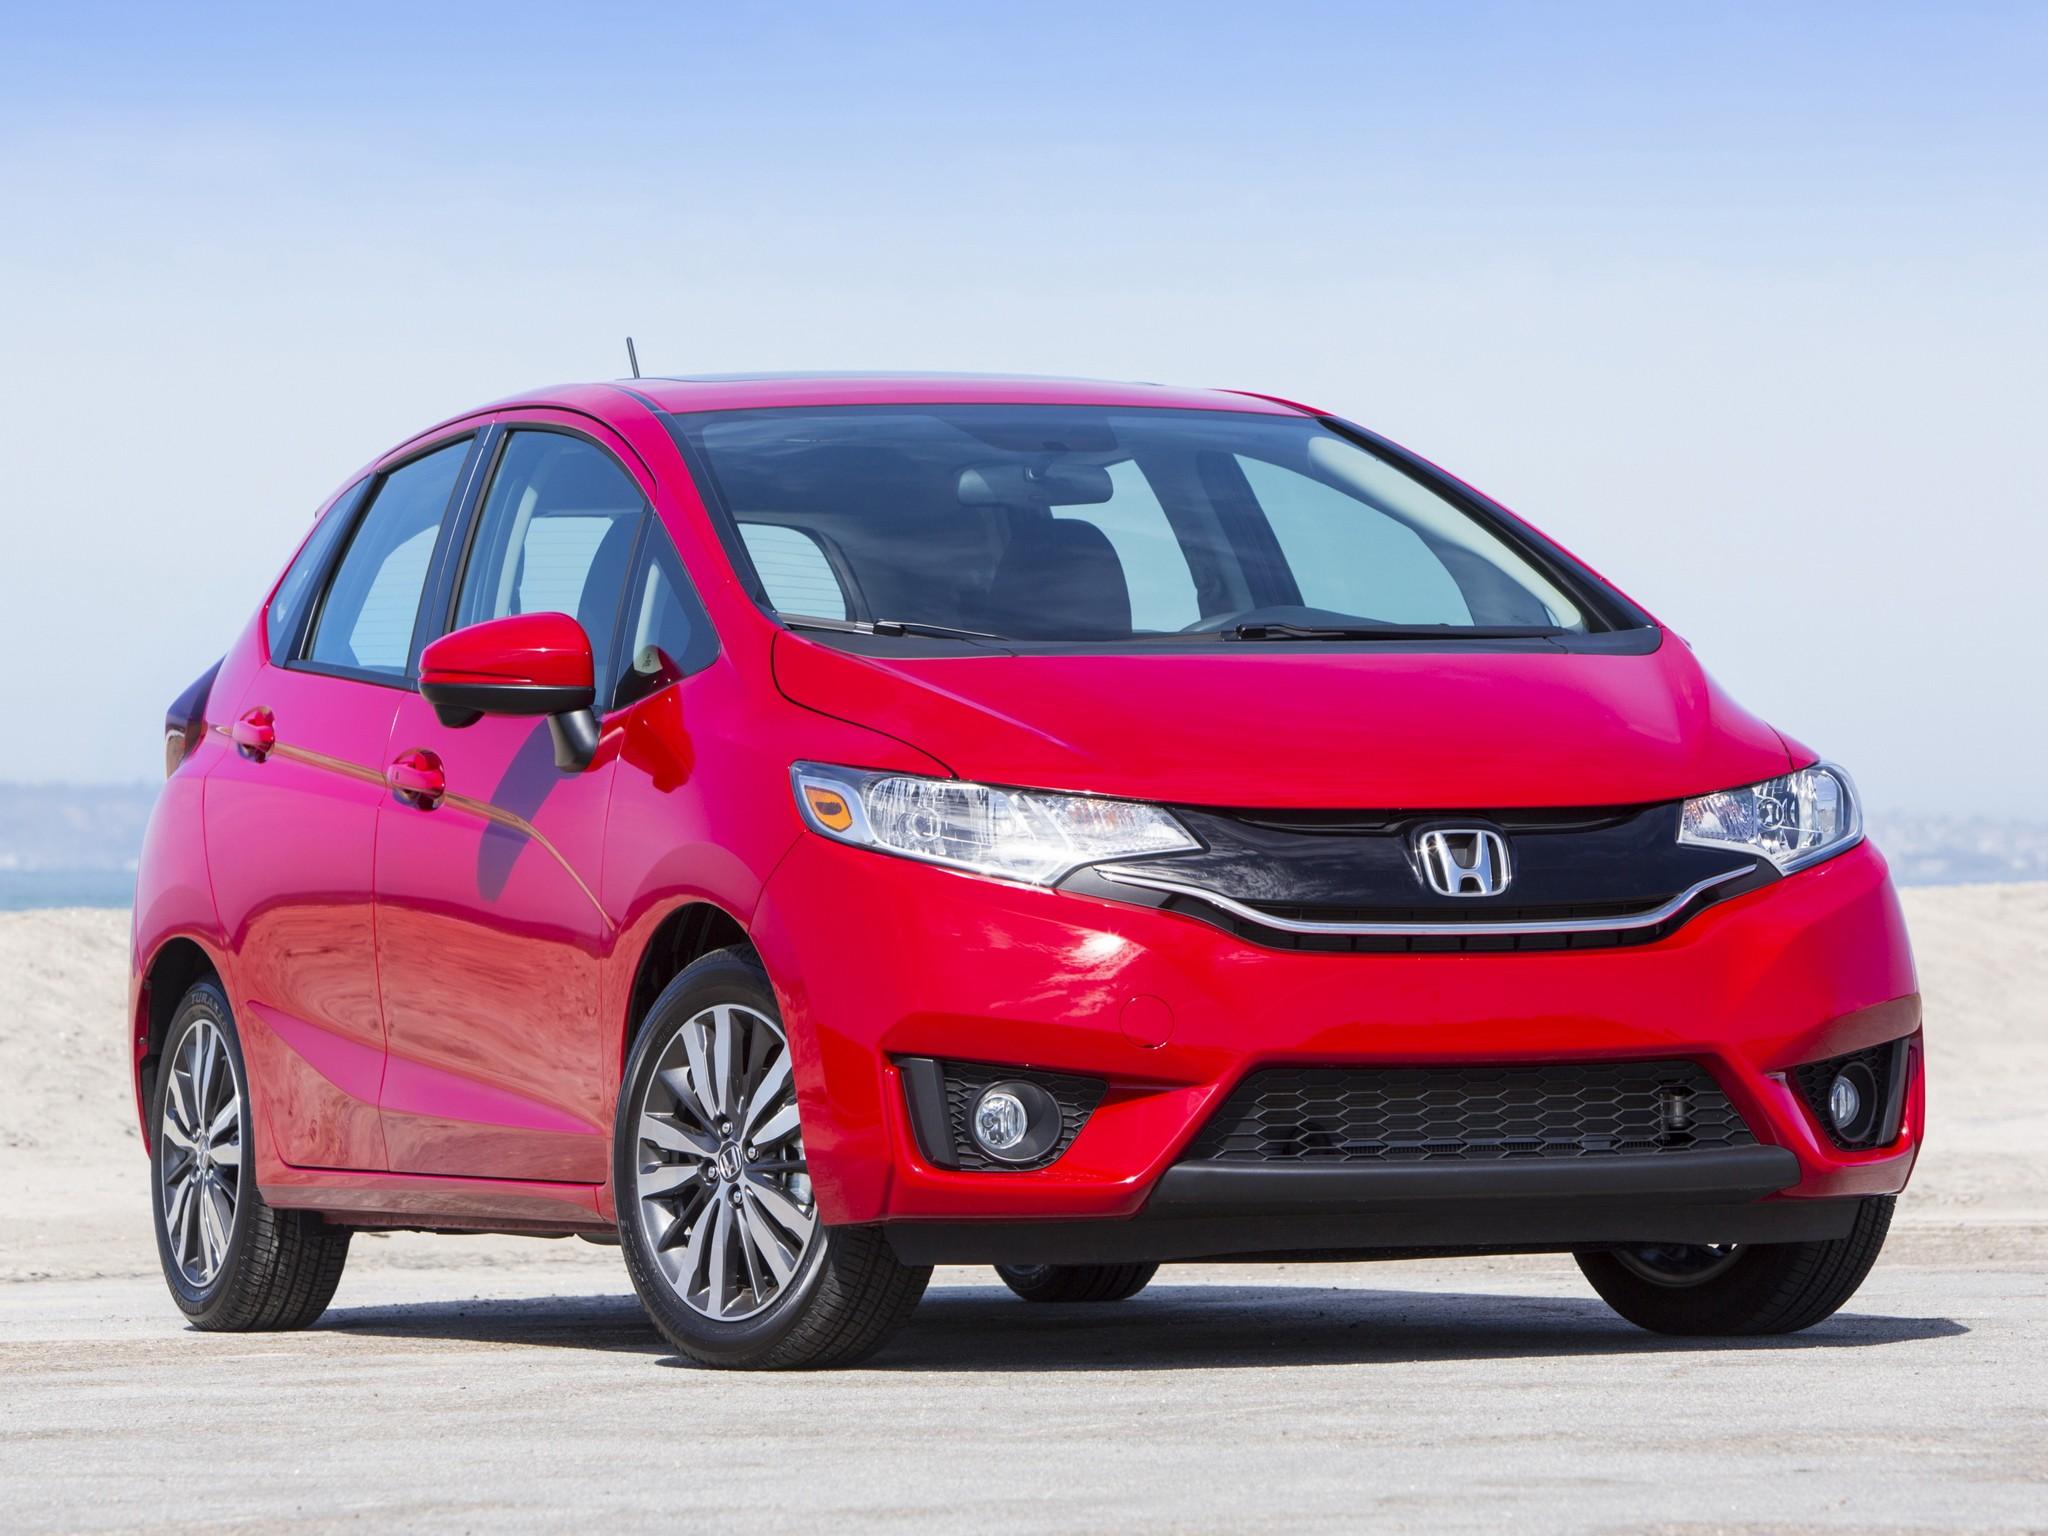 Honda jazz fit specs 2013 2014 2015 2016 2017 for Honda fit horsepower